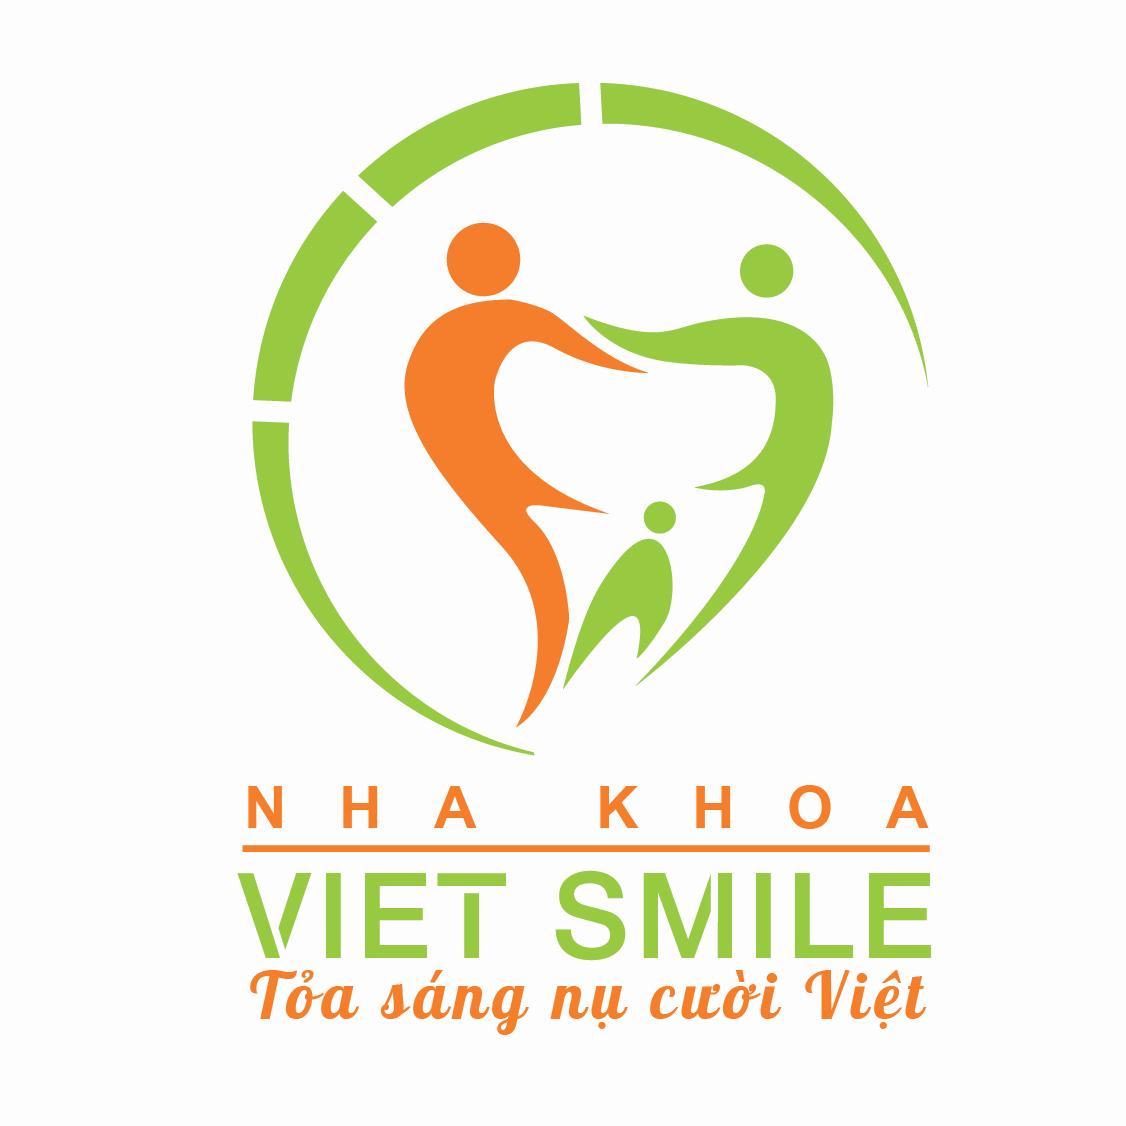 Nha Khoa VIET SMILE